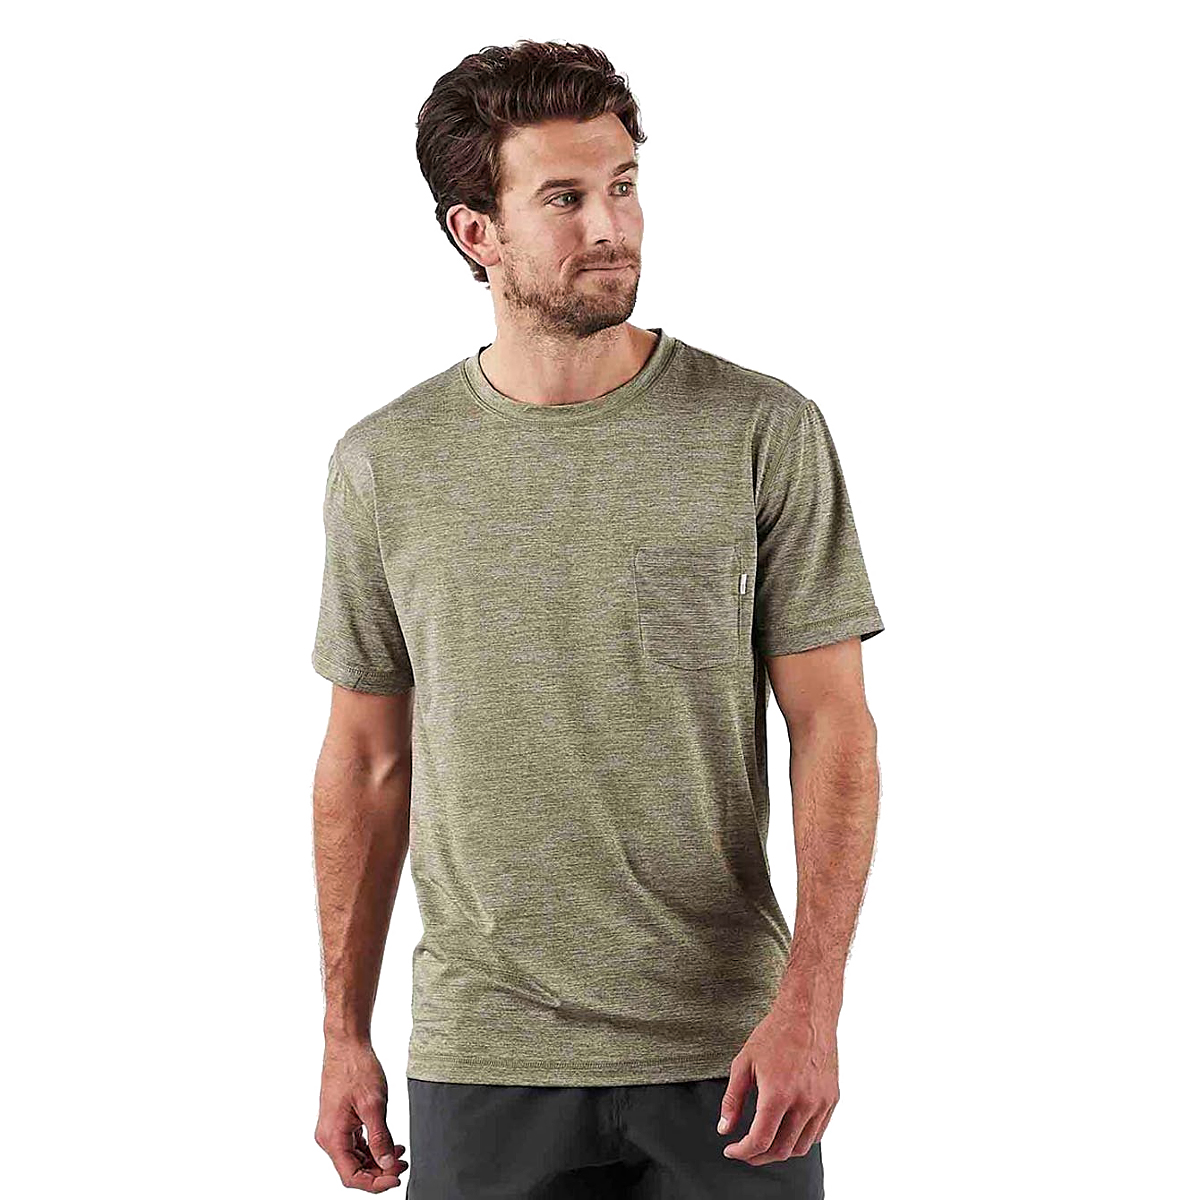 Men's Vuori Tradewind Performance Tee  - Color: Army Heather - Size: S, Army Heather, large, image 2